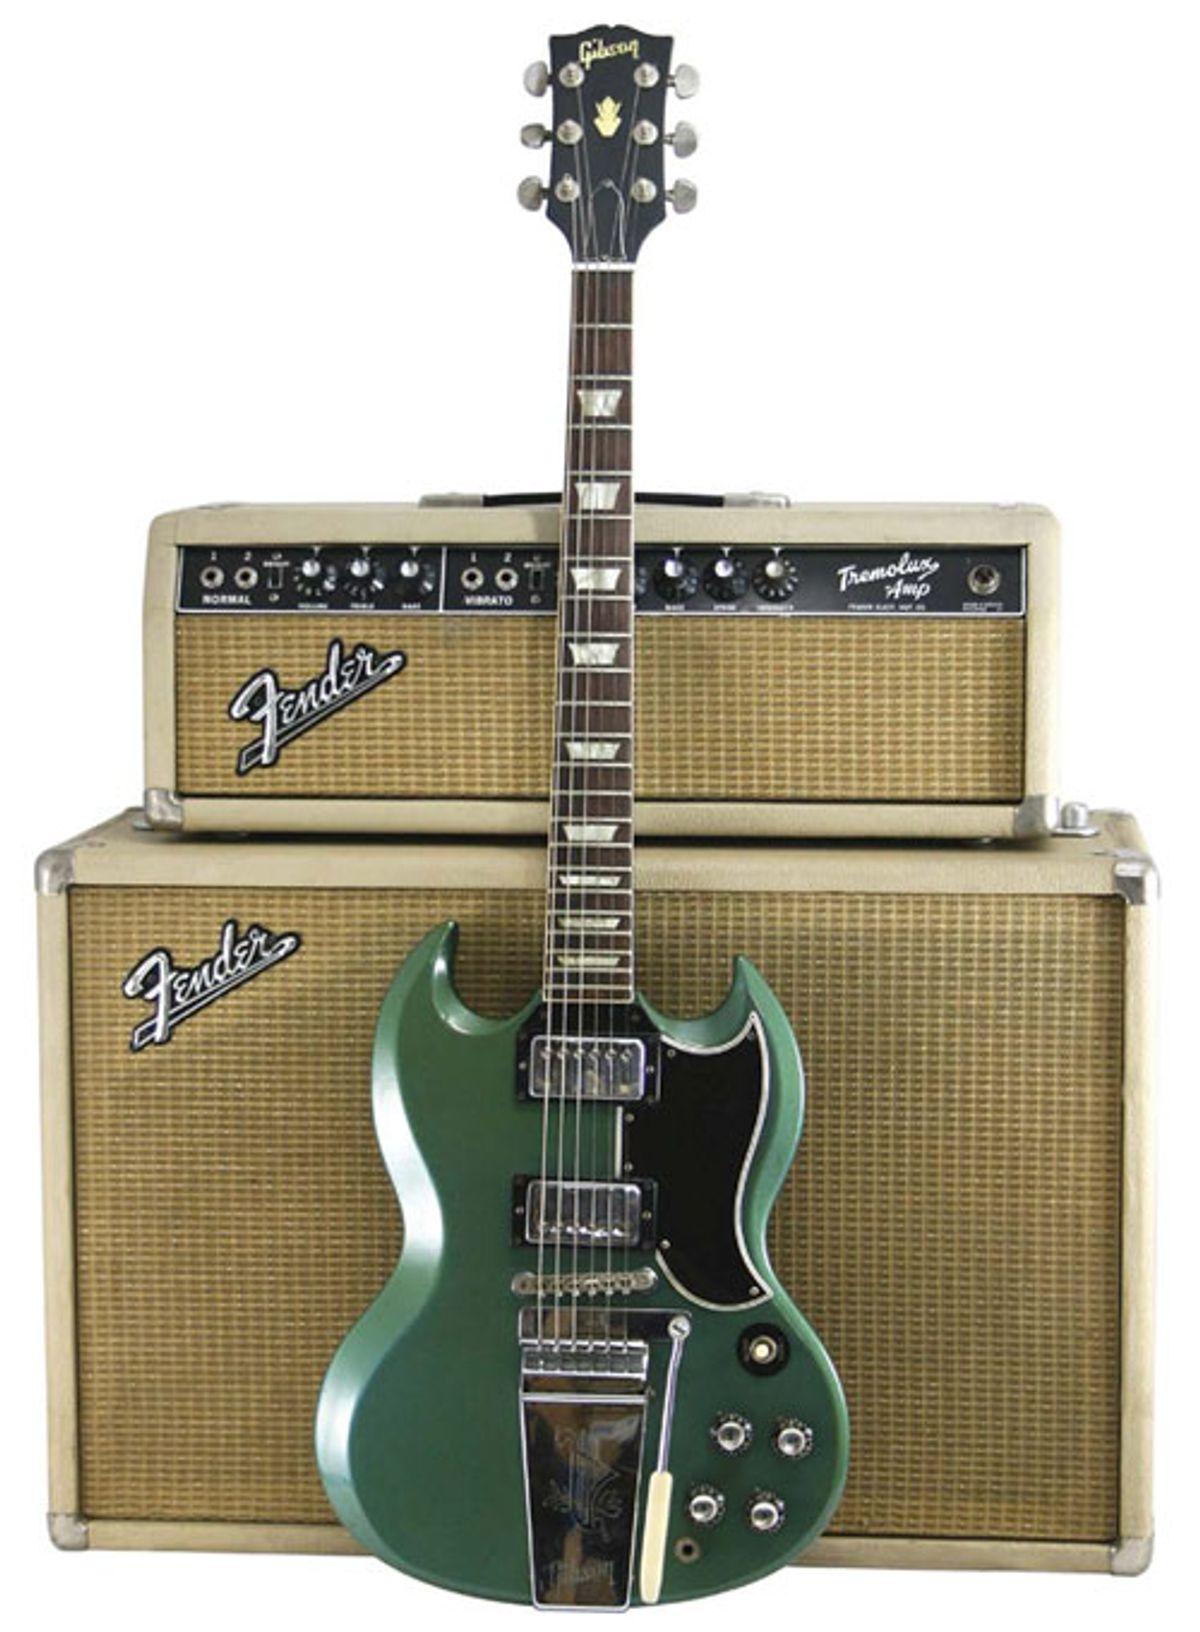 1965 Gibson SG in Pelham Blue Serial No. 505348